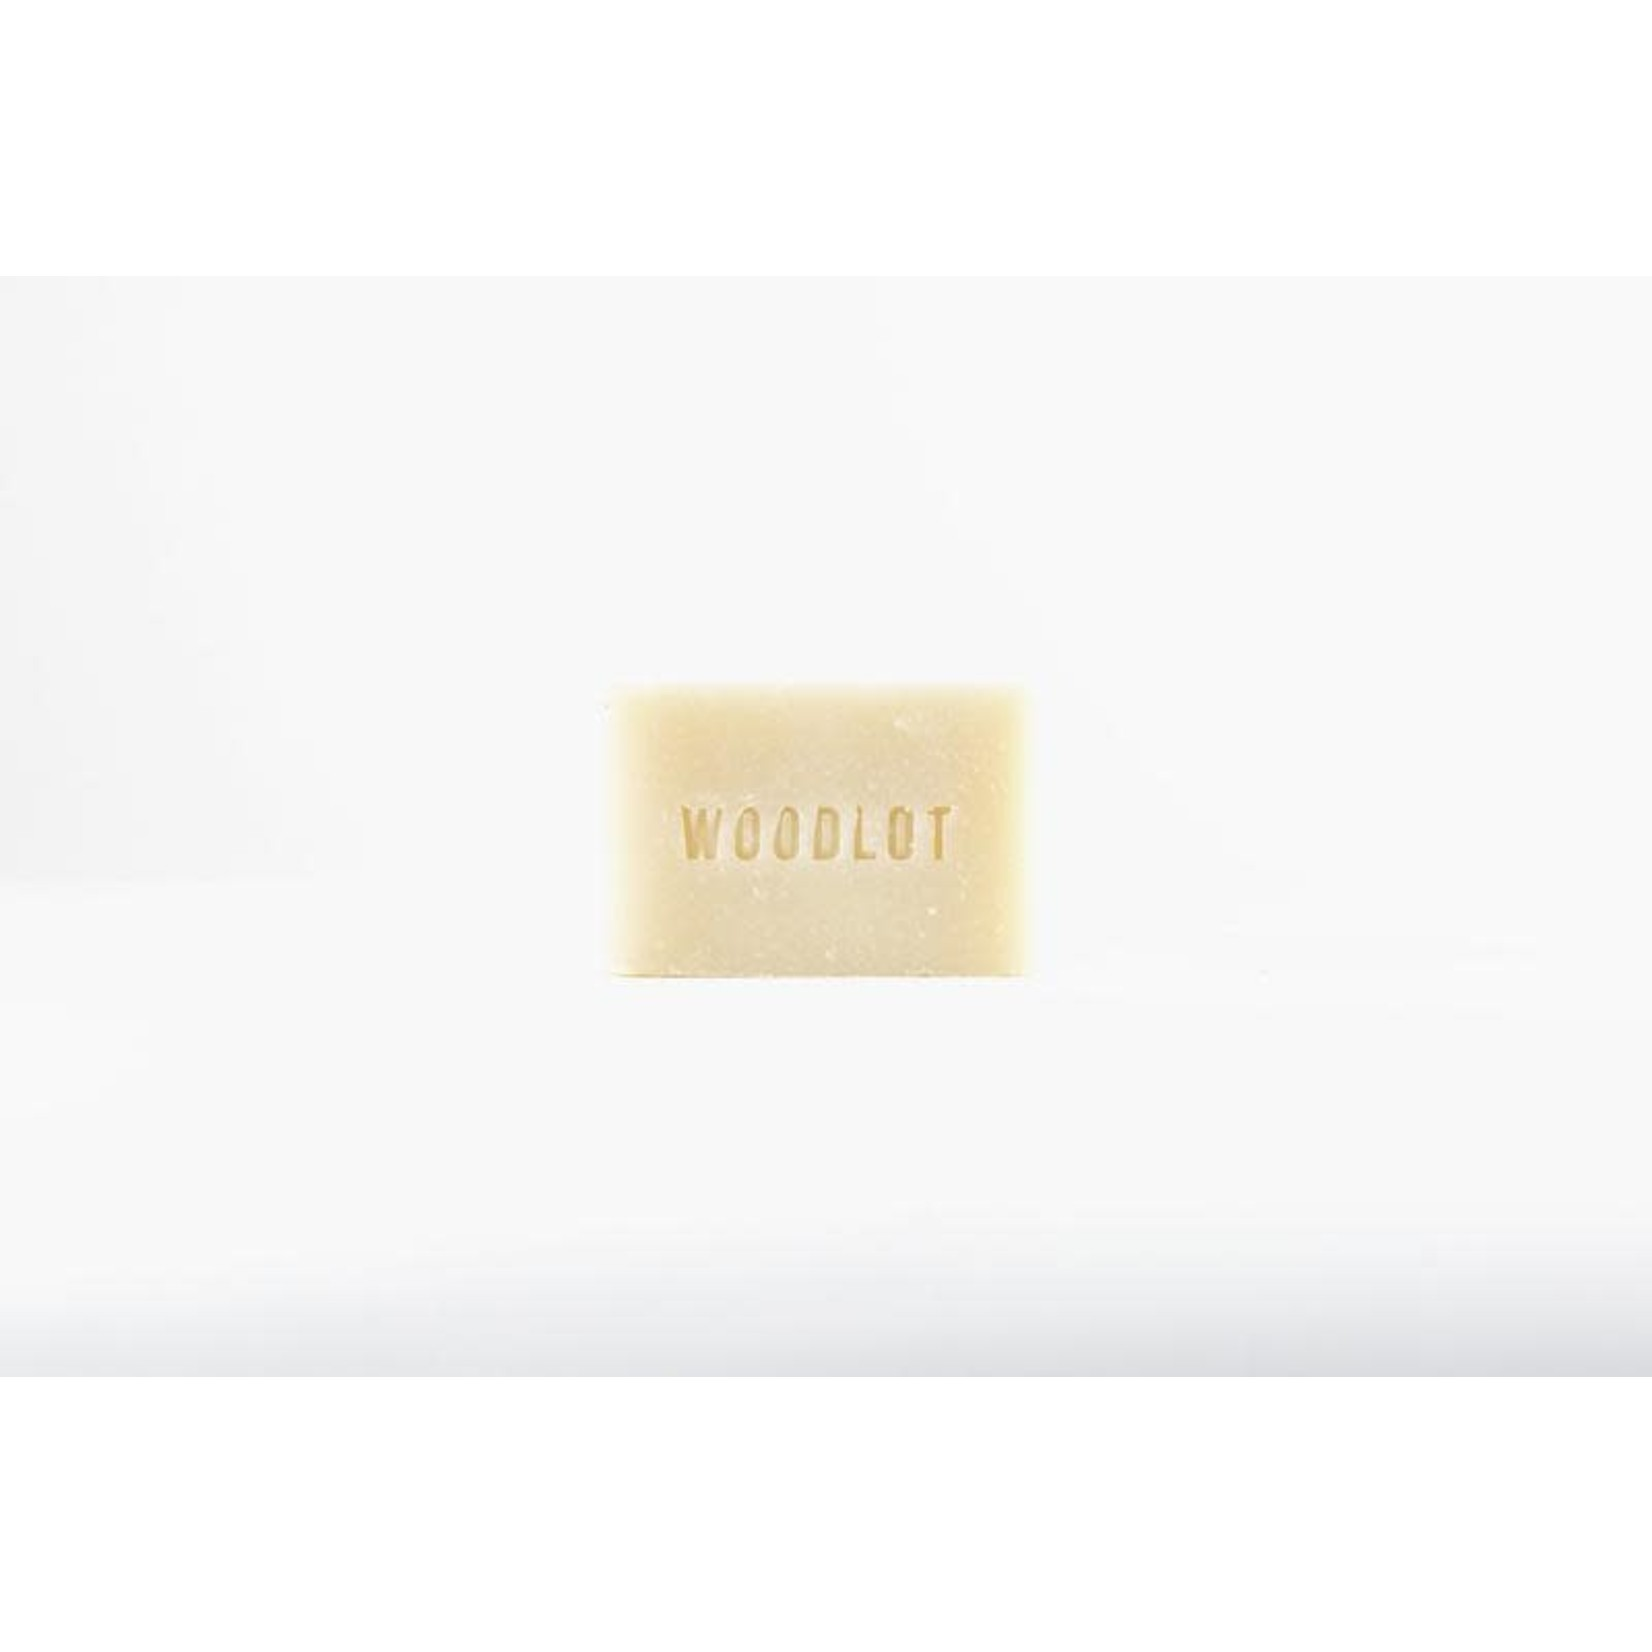 Woodlot Woodlot - savon recharge